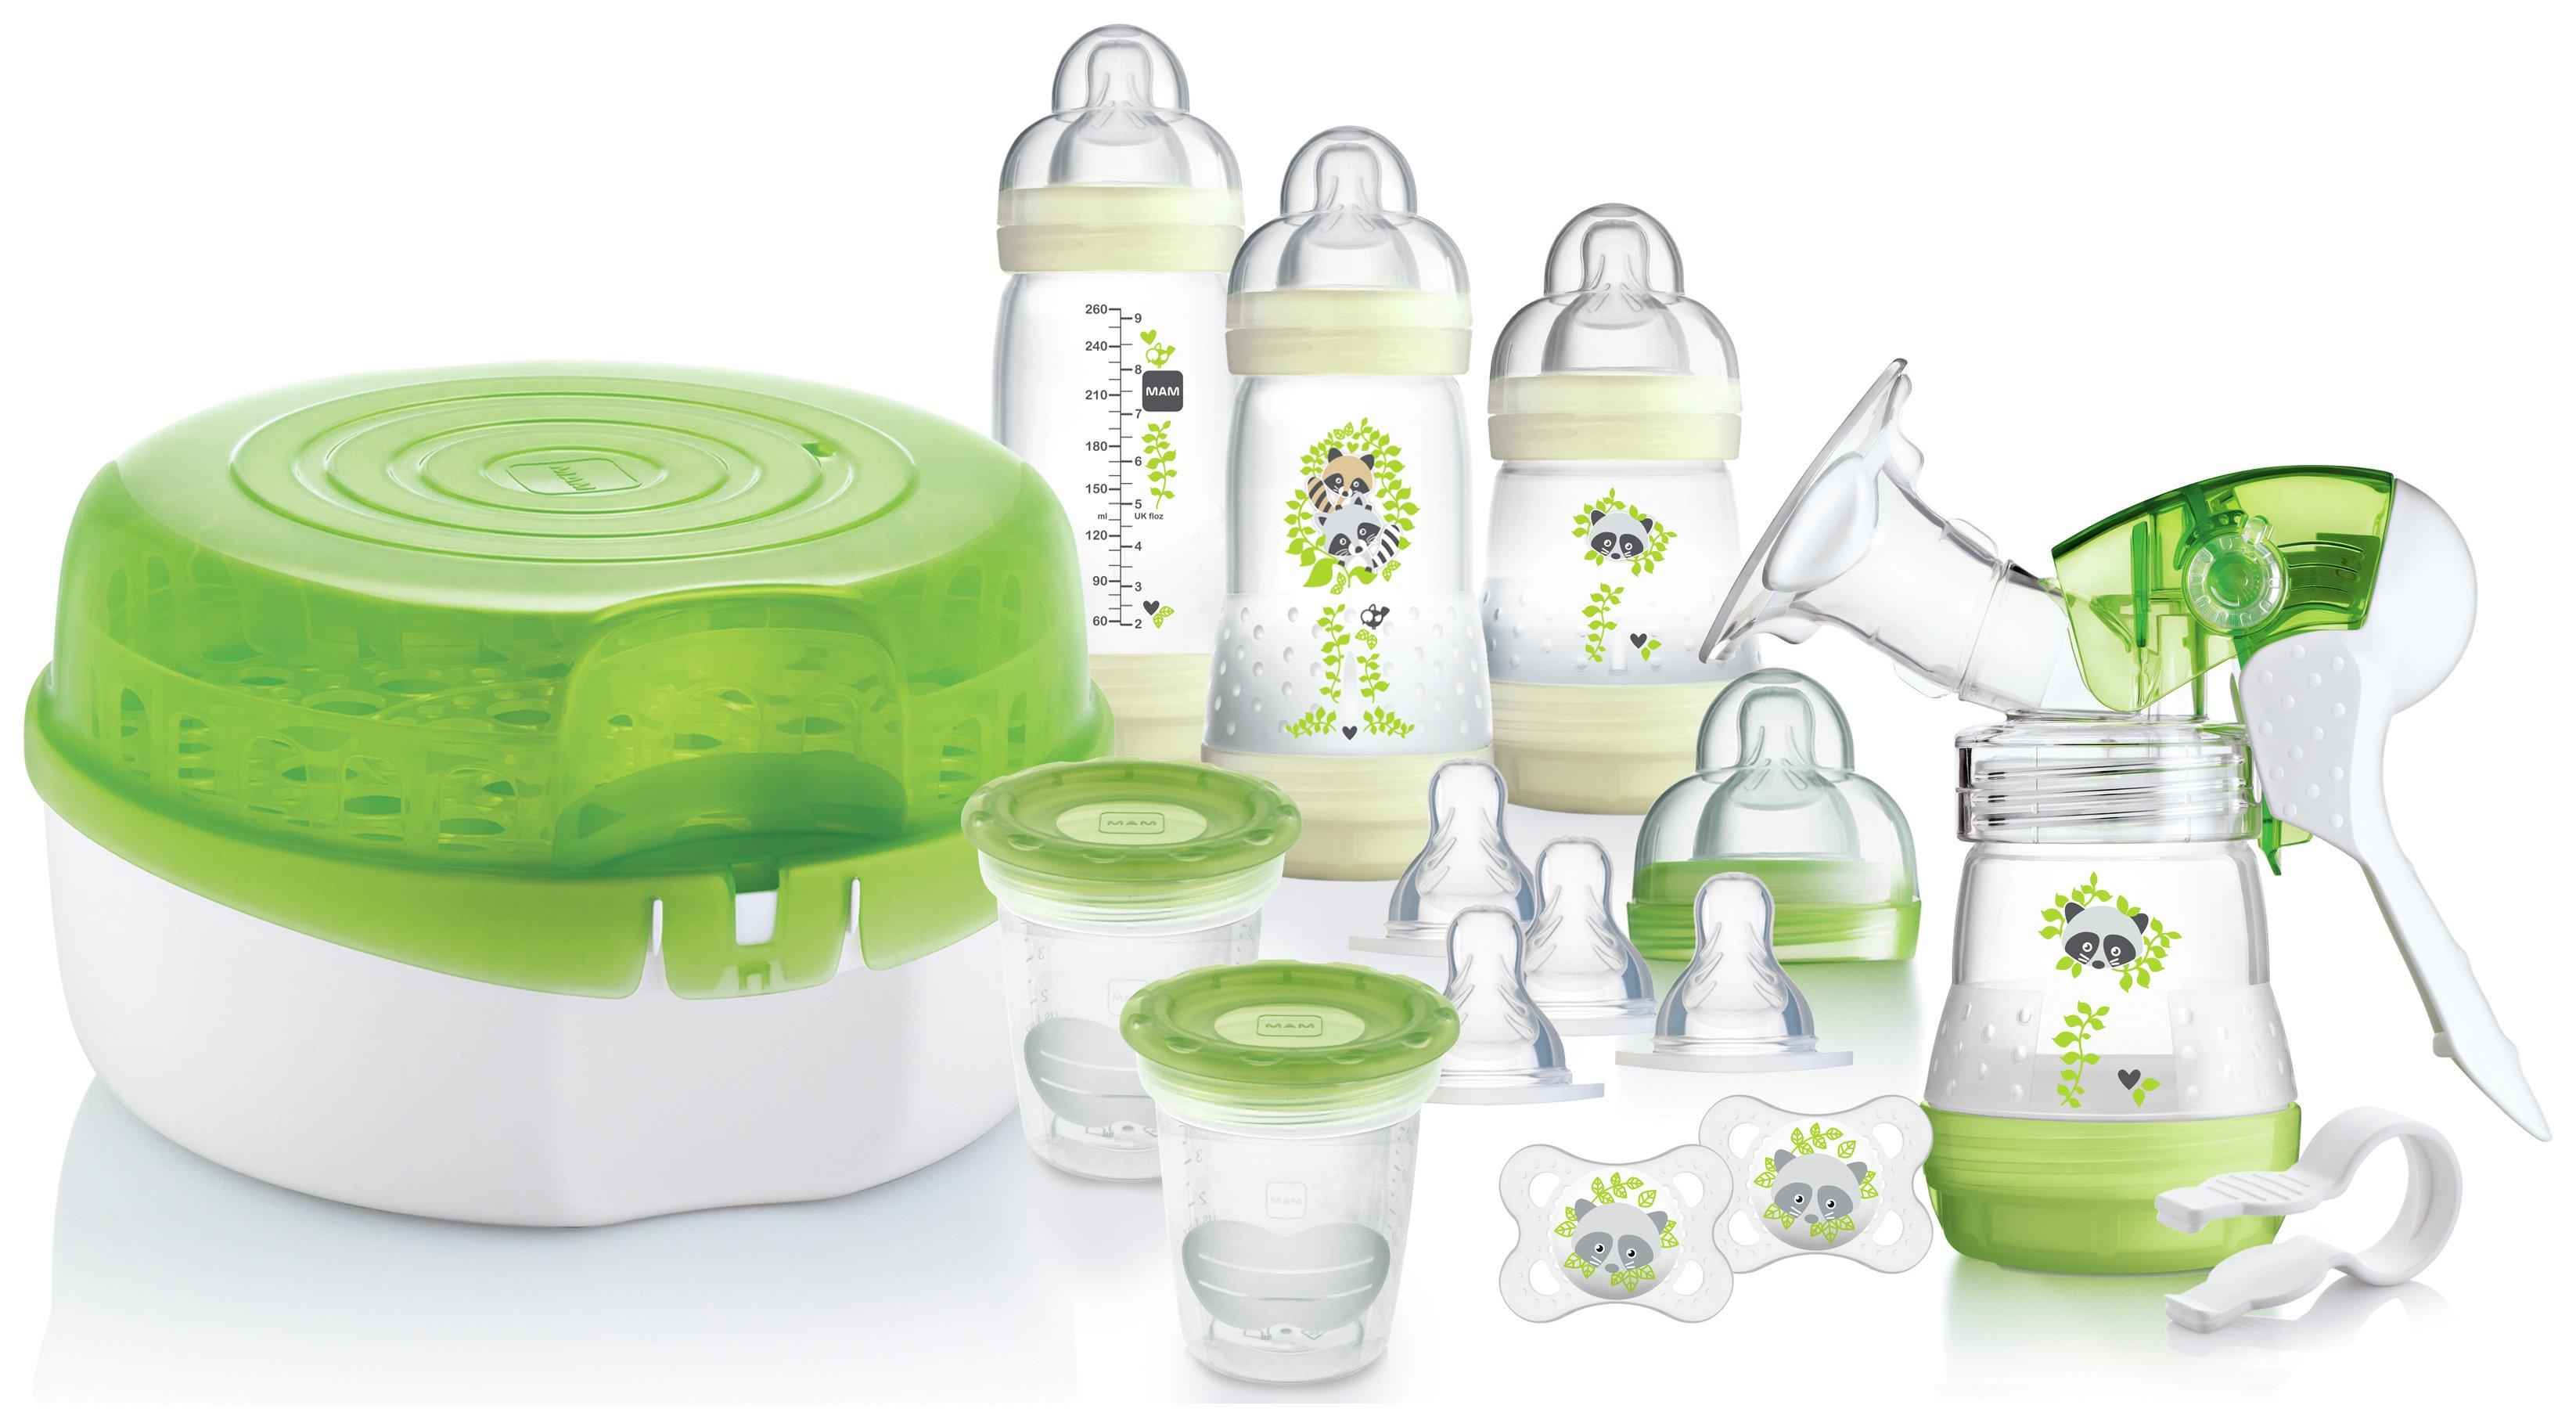 Image of MAM Breastfeeding and Steriliser Set.